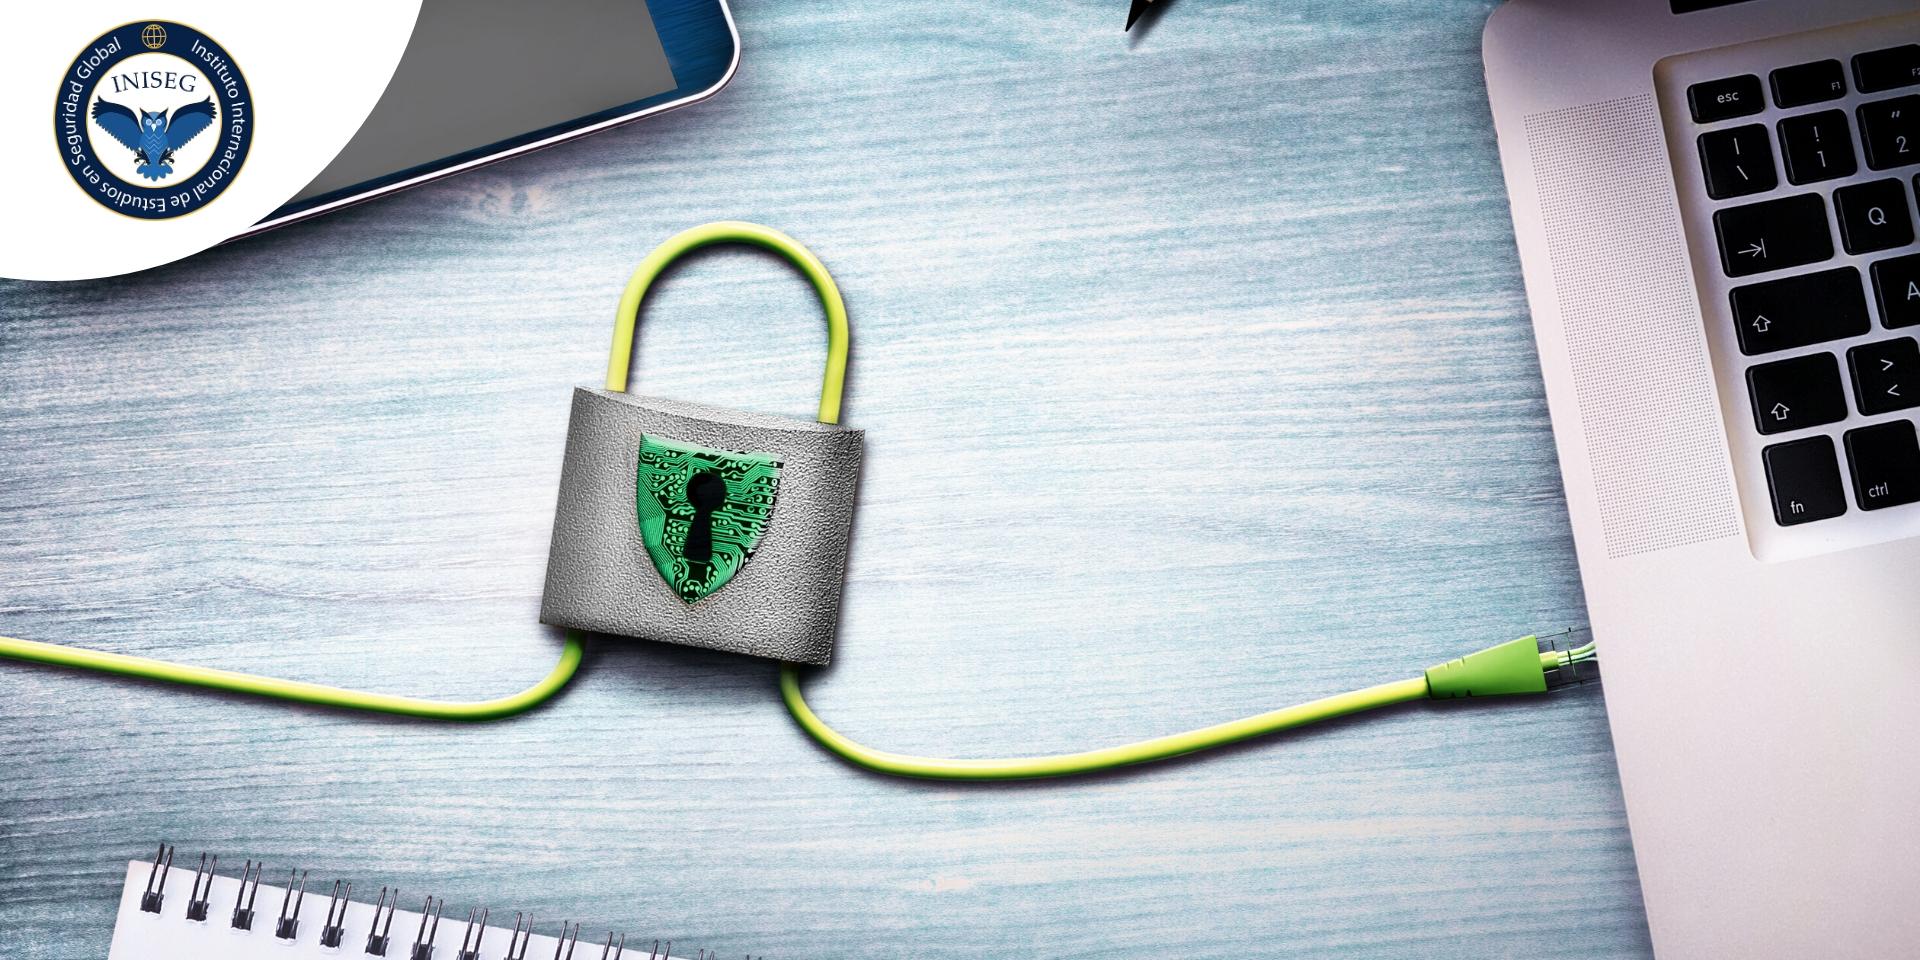 Seguros contra riesgos cibernéticos